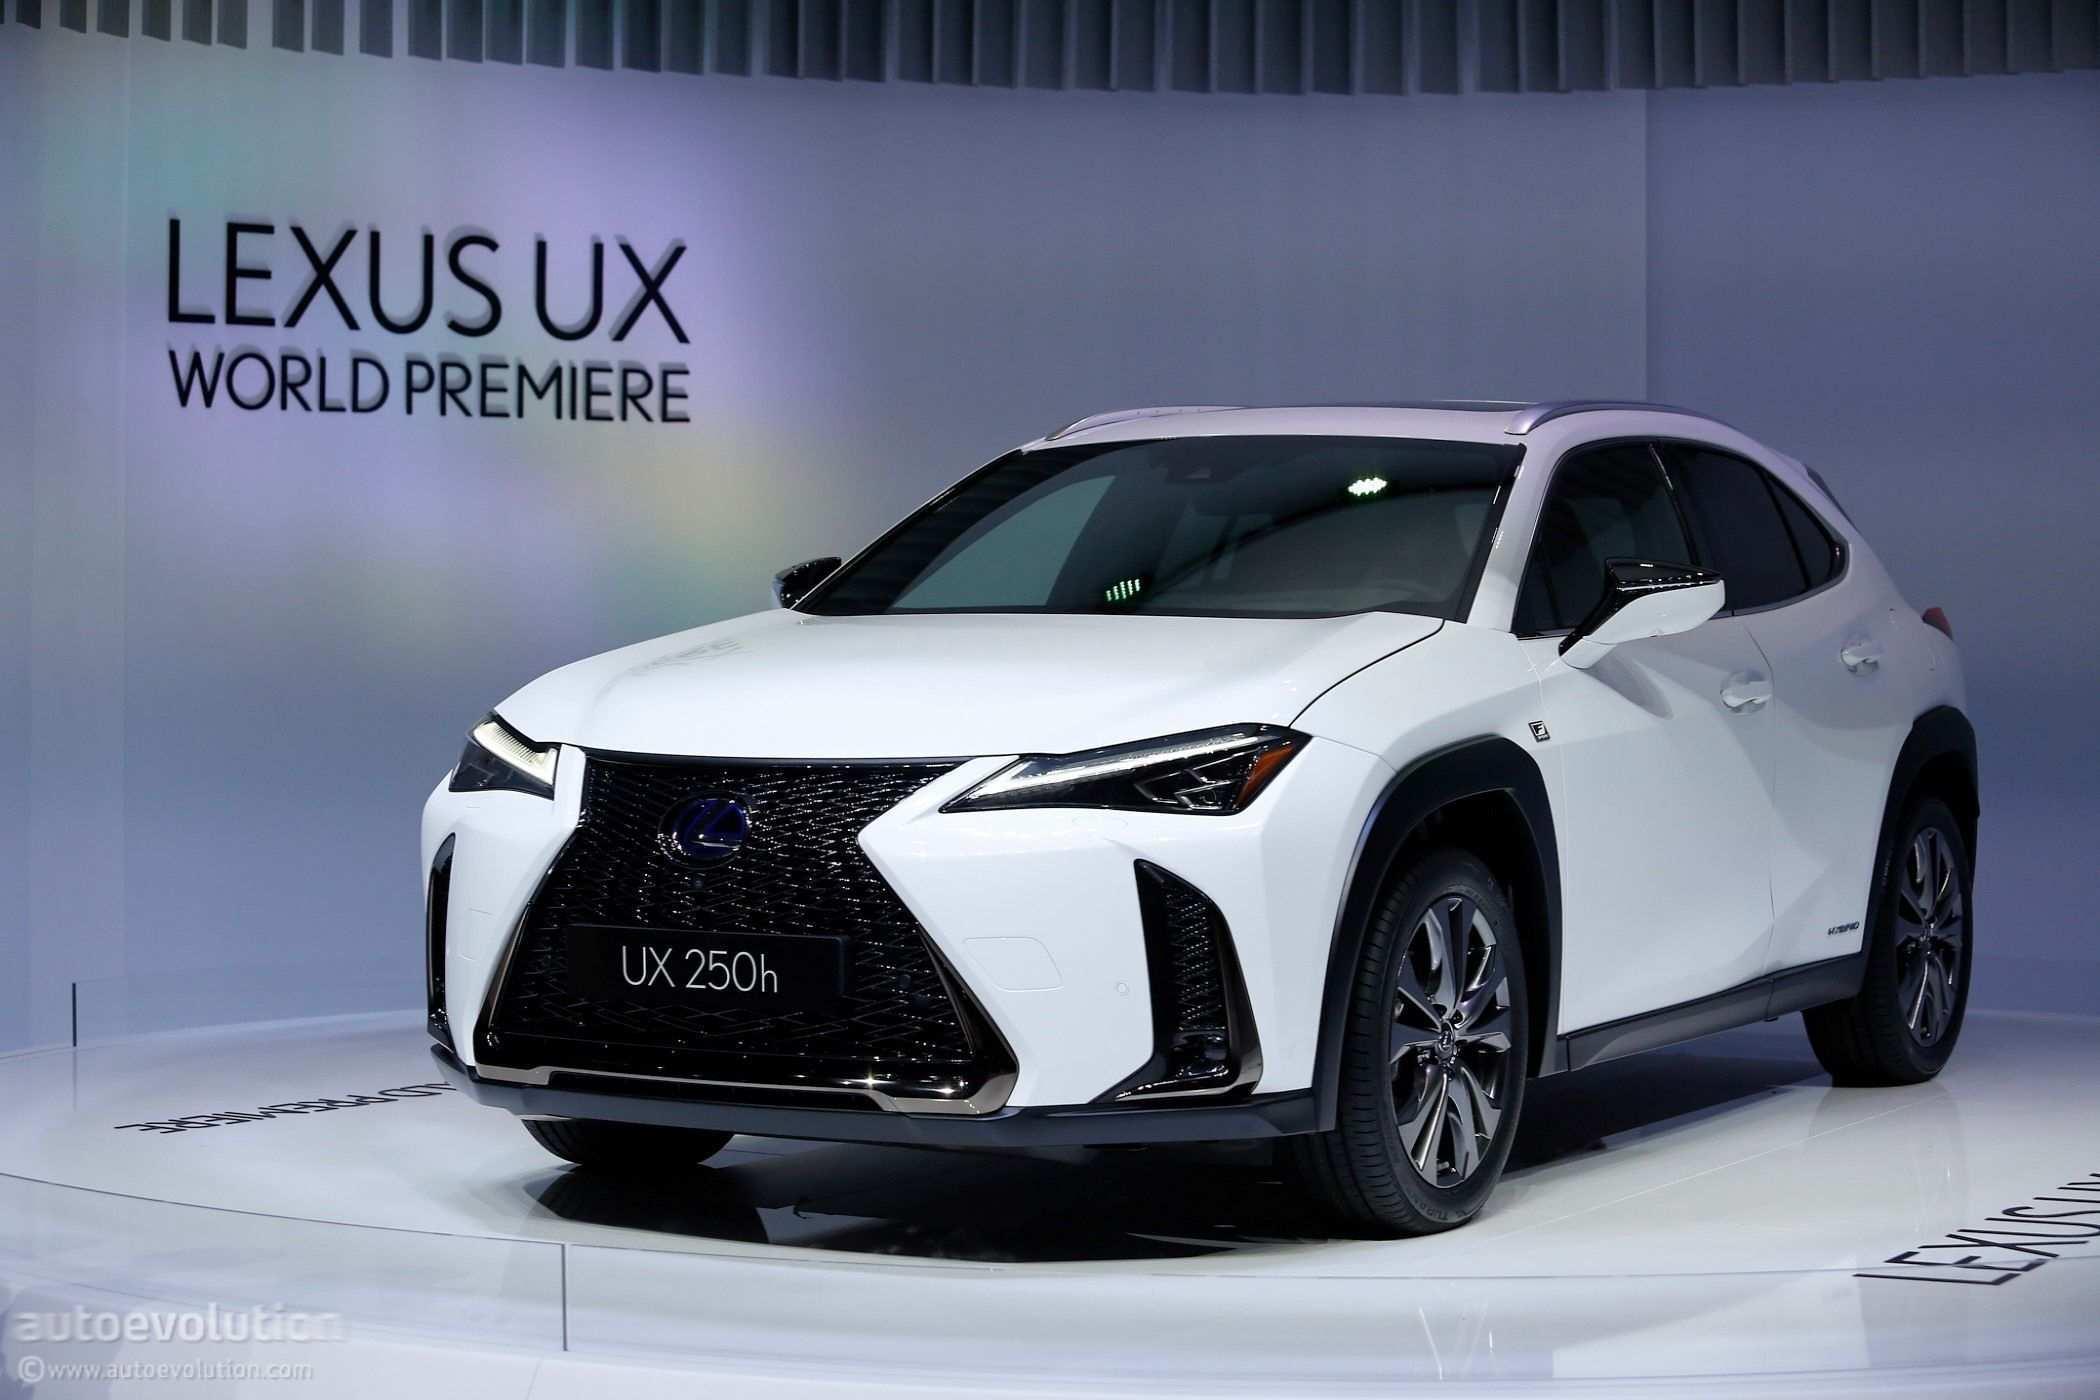 58 All New 2019 Lexus Minivan Exterior and Interior with 2019 Lexus Minivan